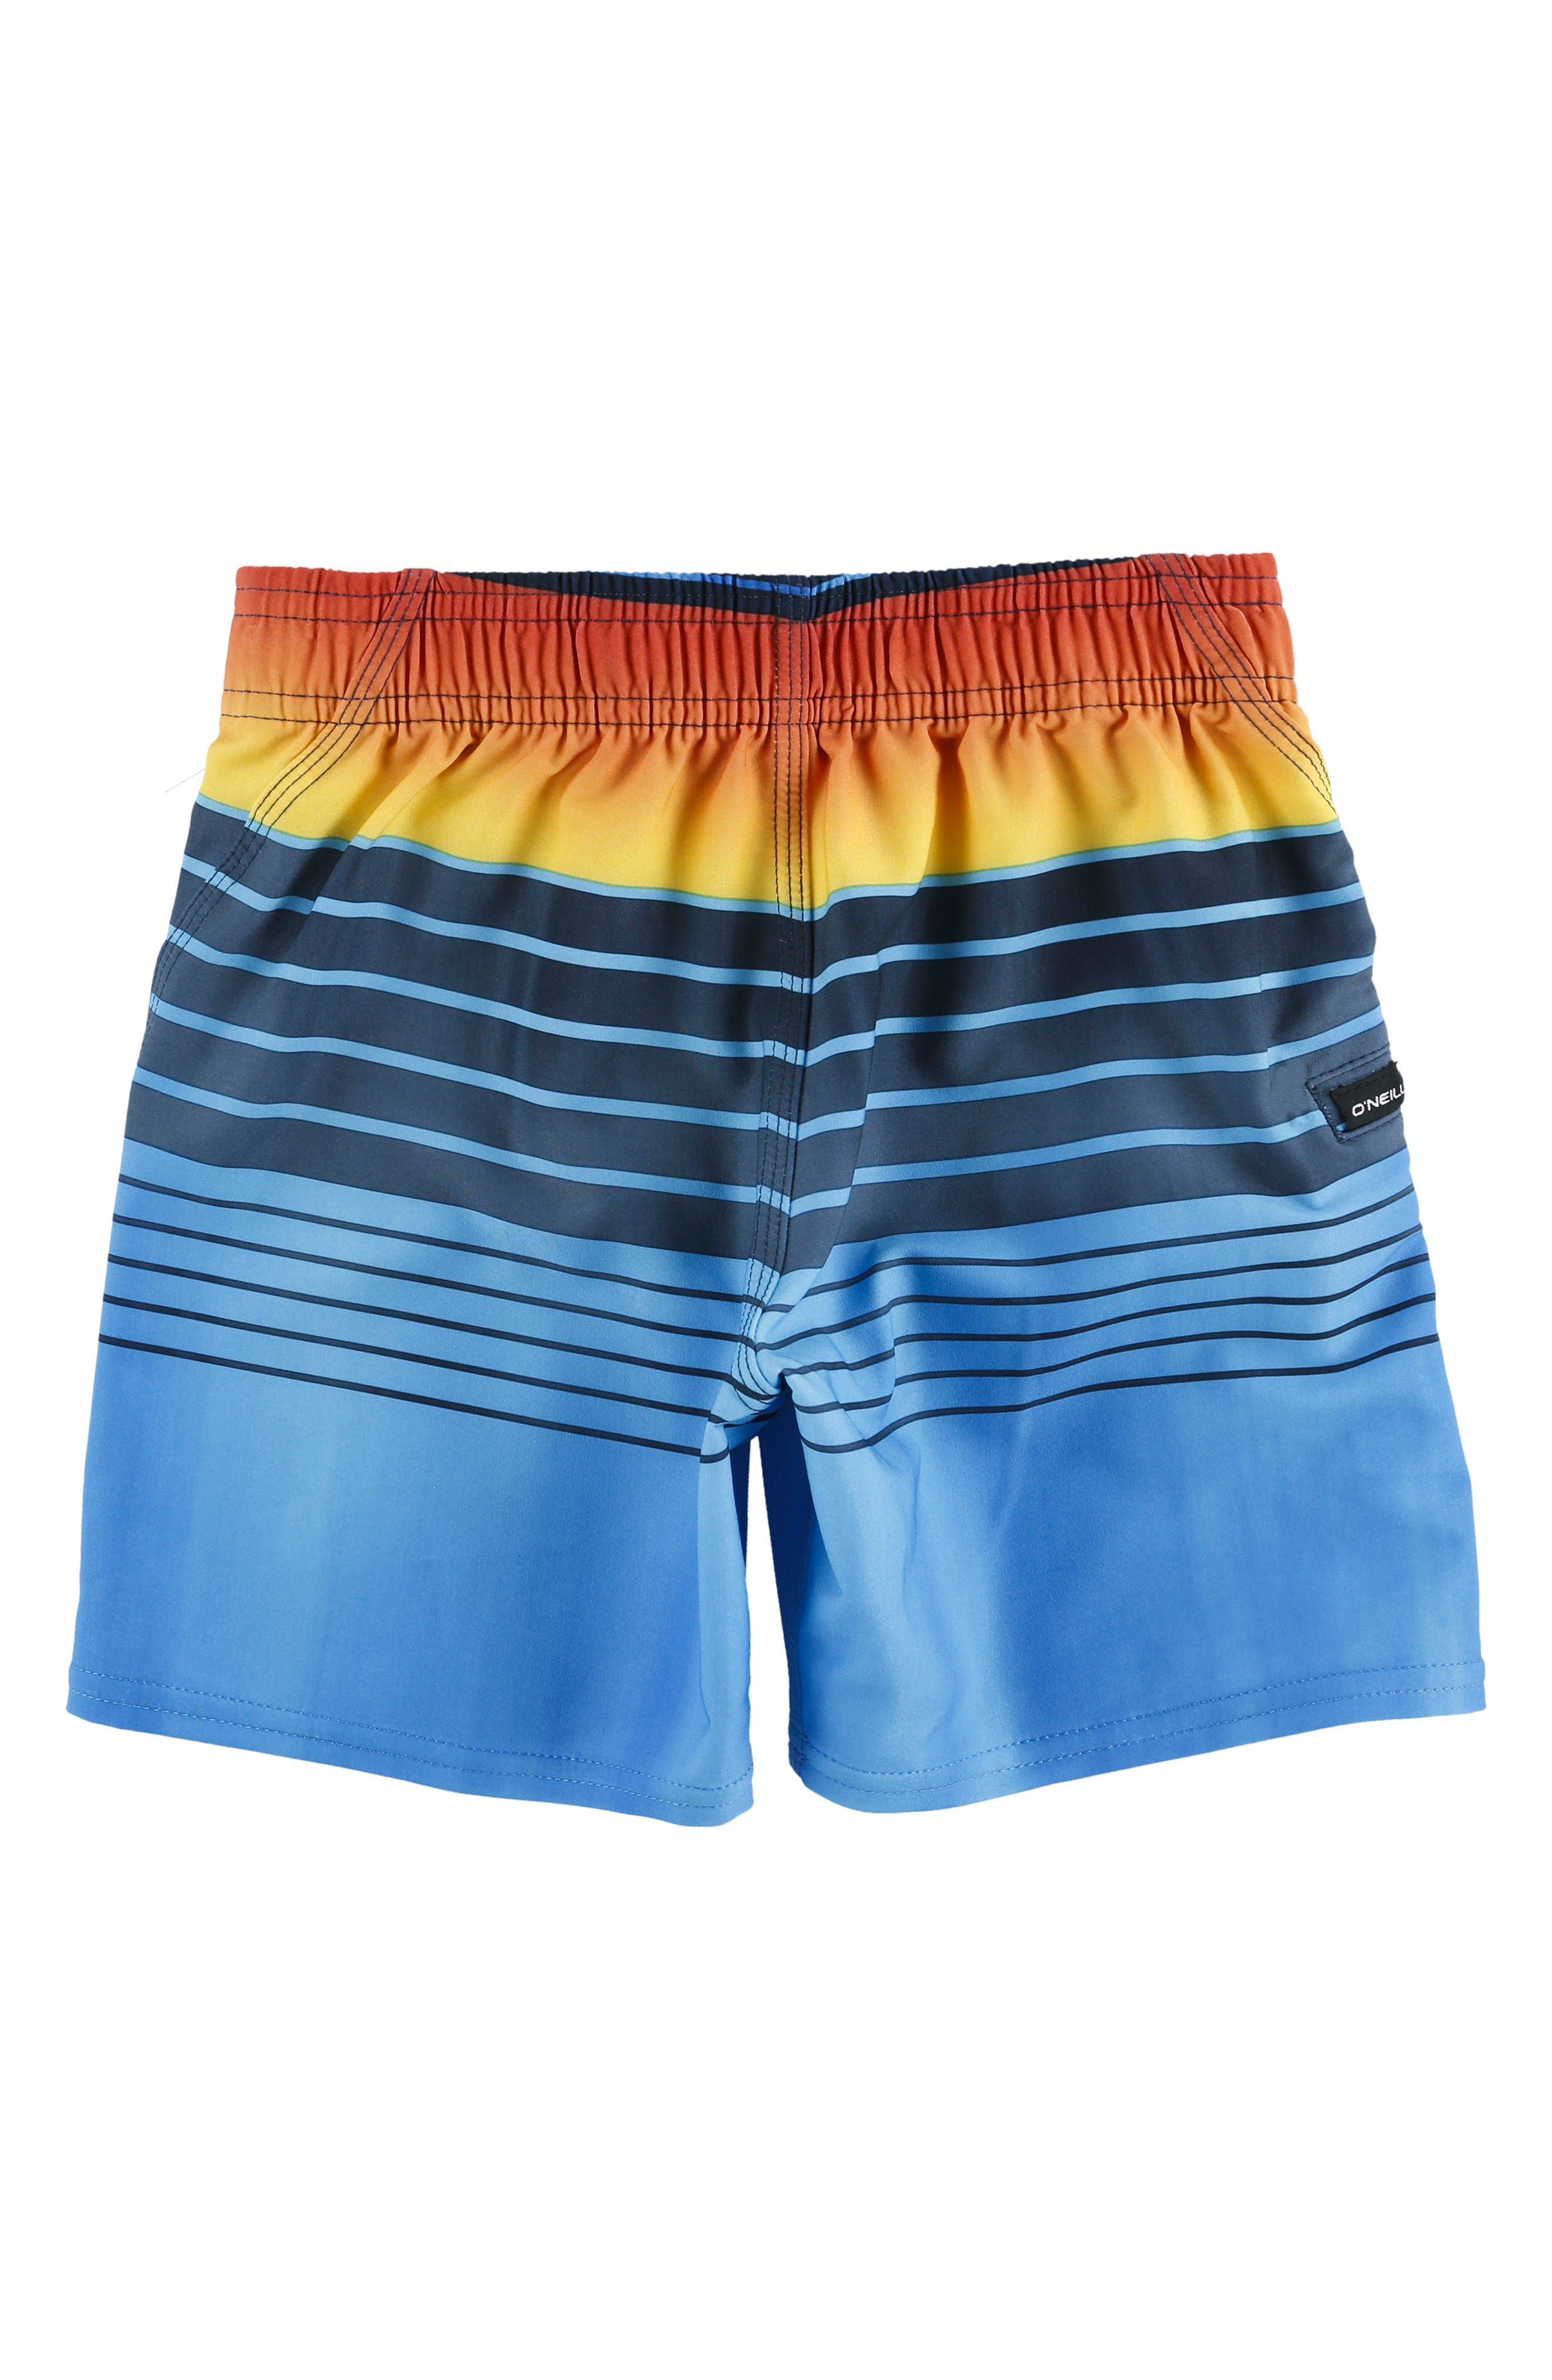 Hyperfreak Heist Board Shorts,                             Alternate thumbnail 2, color,                             Blue